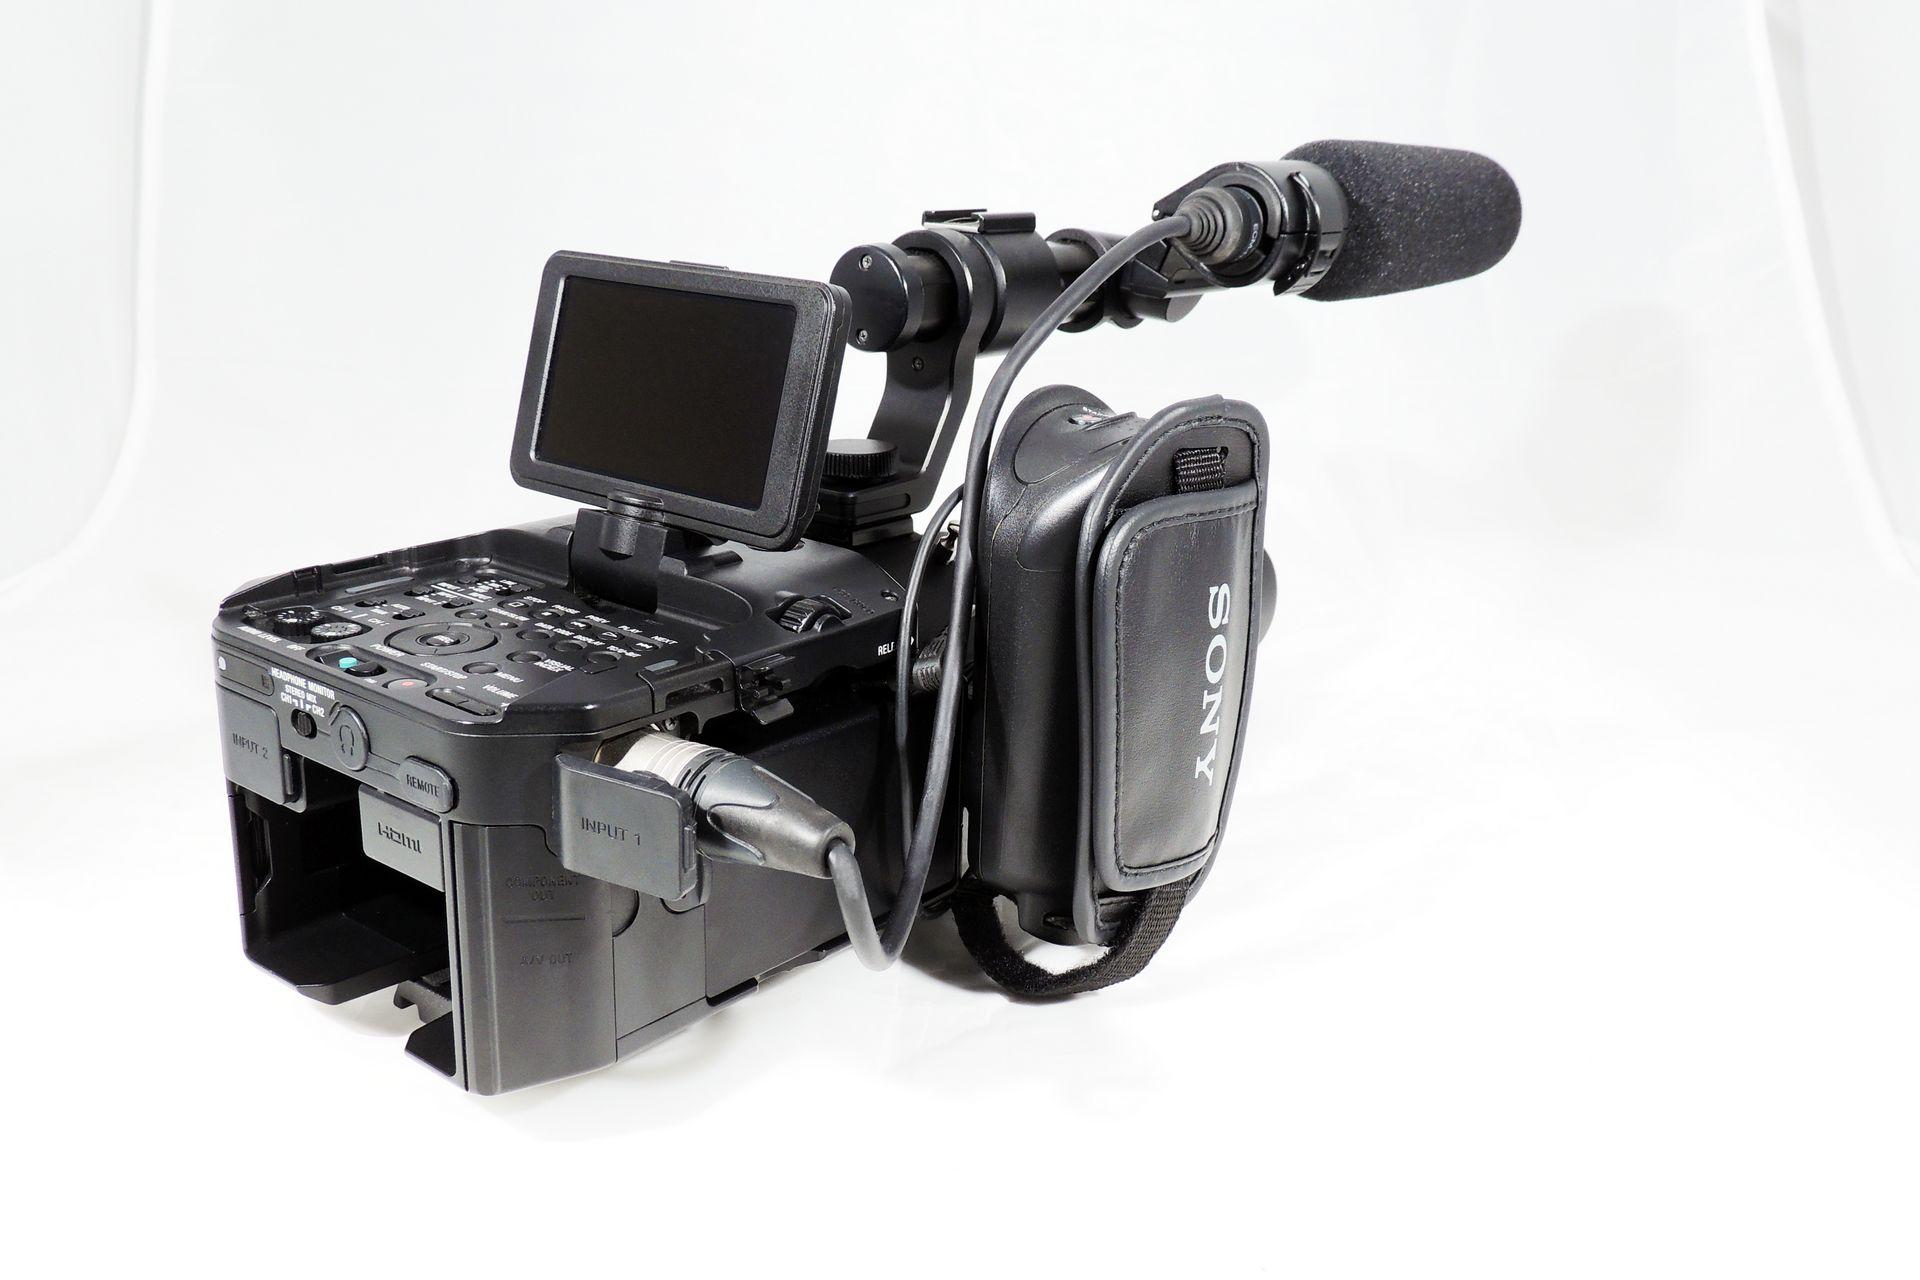 Sony FS-100 bundle for sale at Plasma Music